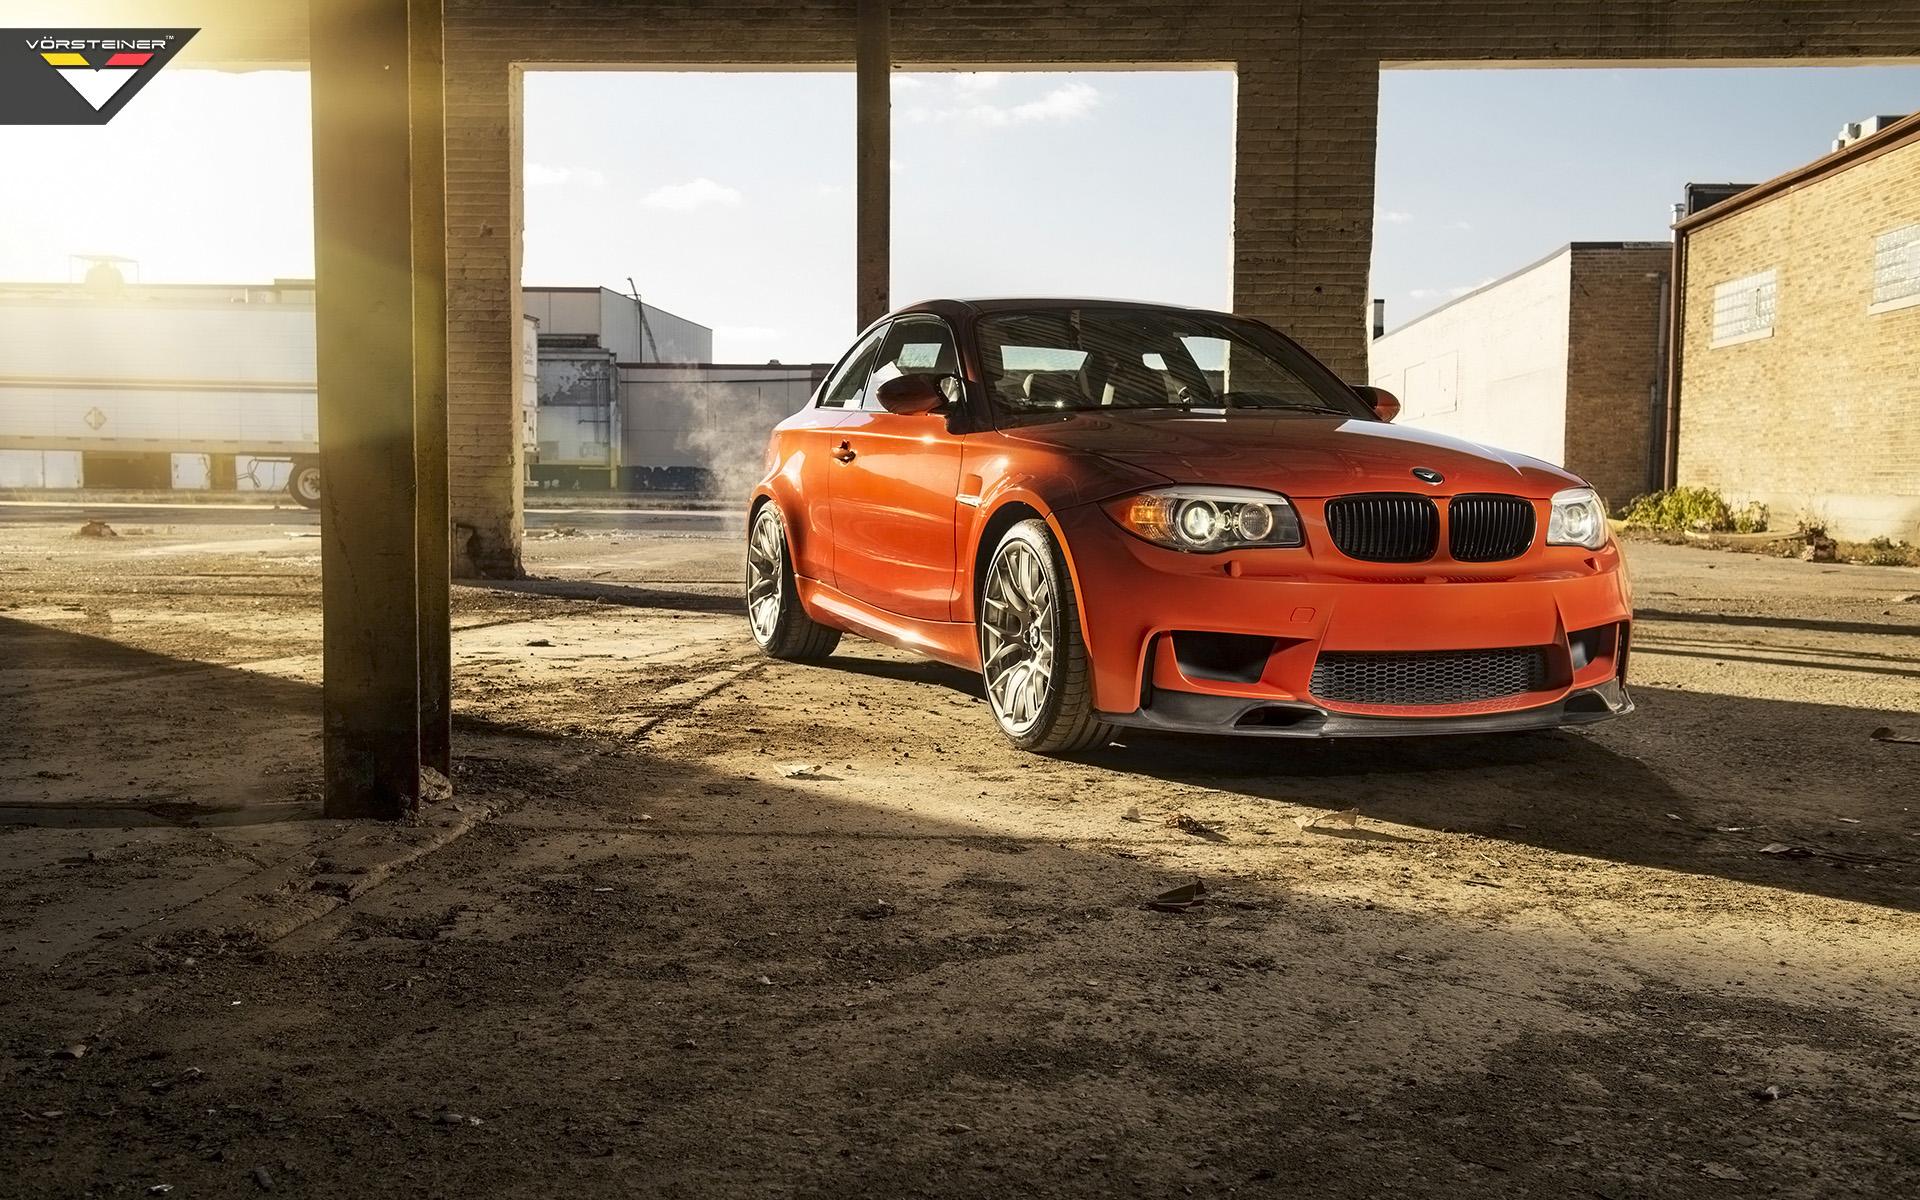 Vorsteiner BMW E82 1M Coupe 2014 Wallpaper | HD Car ...